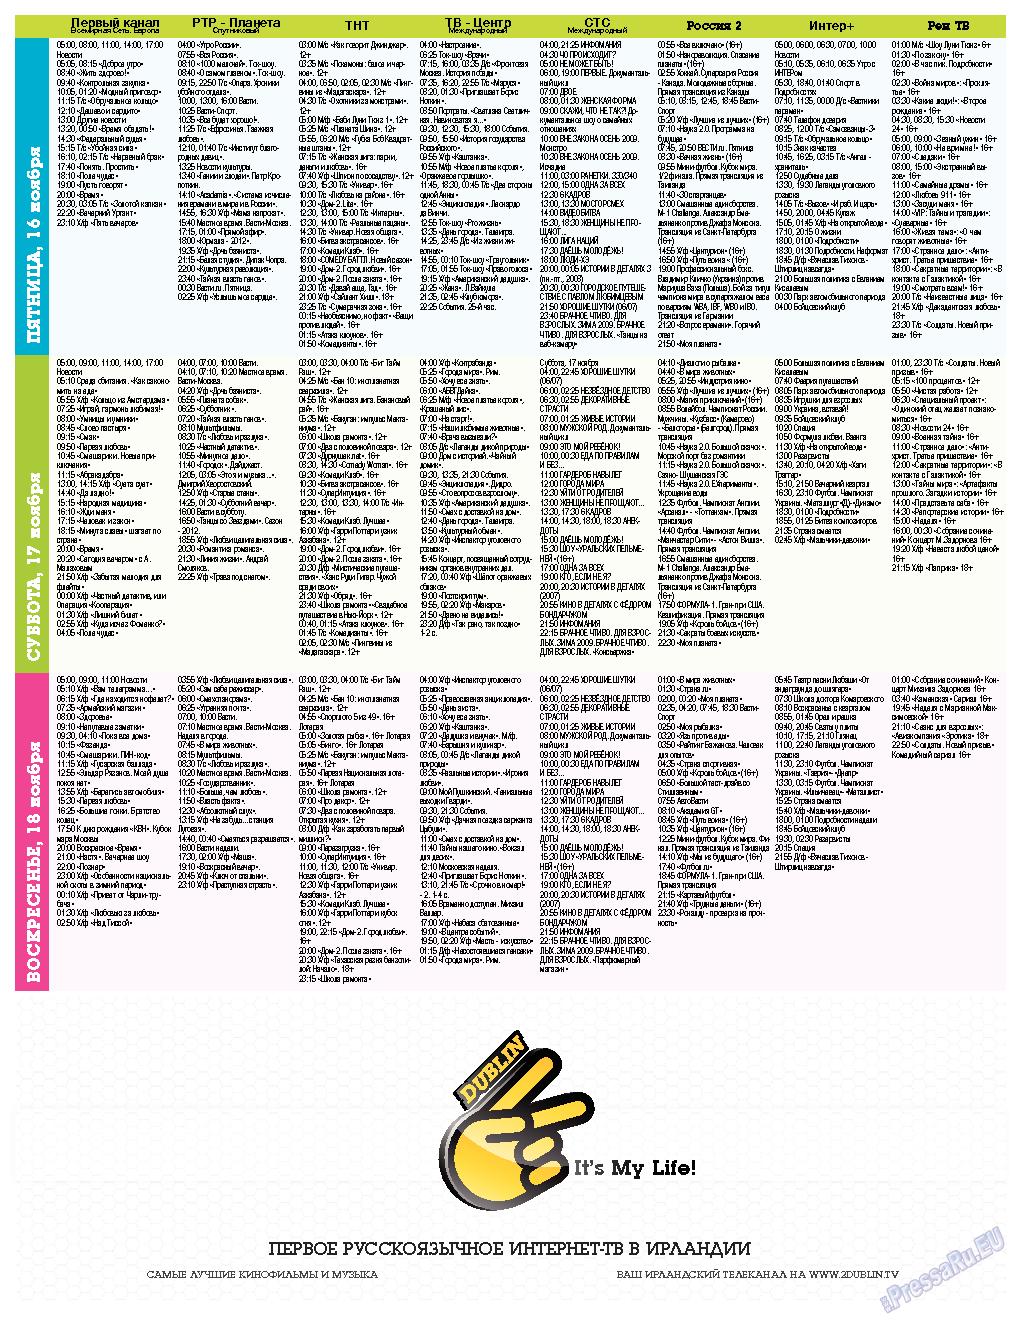 Дублин инфоцентр (газета). 2012 год, номер 42, стр. 9